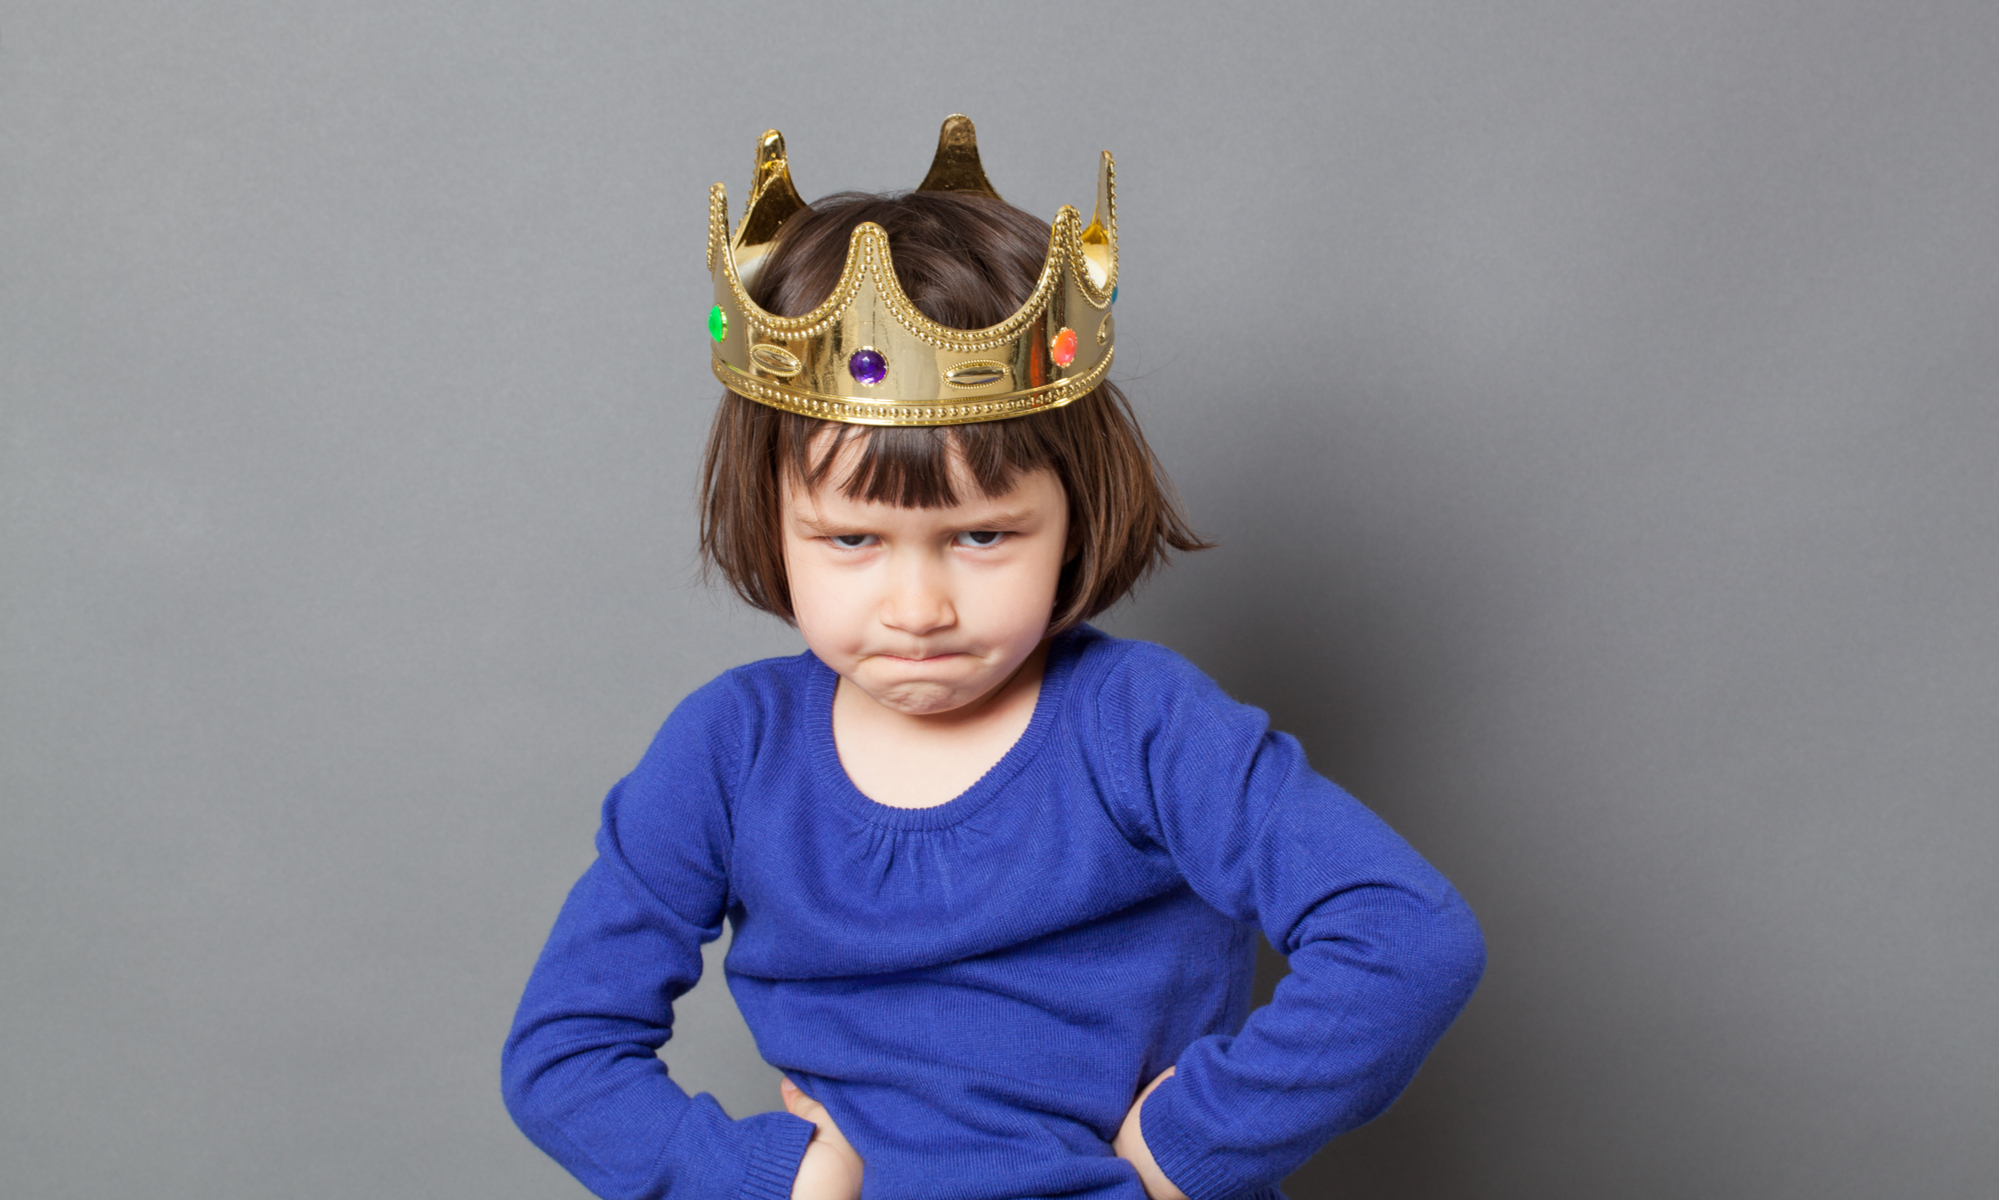 10 признаков избалованного ребенка!